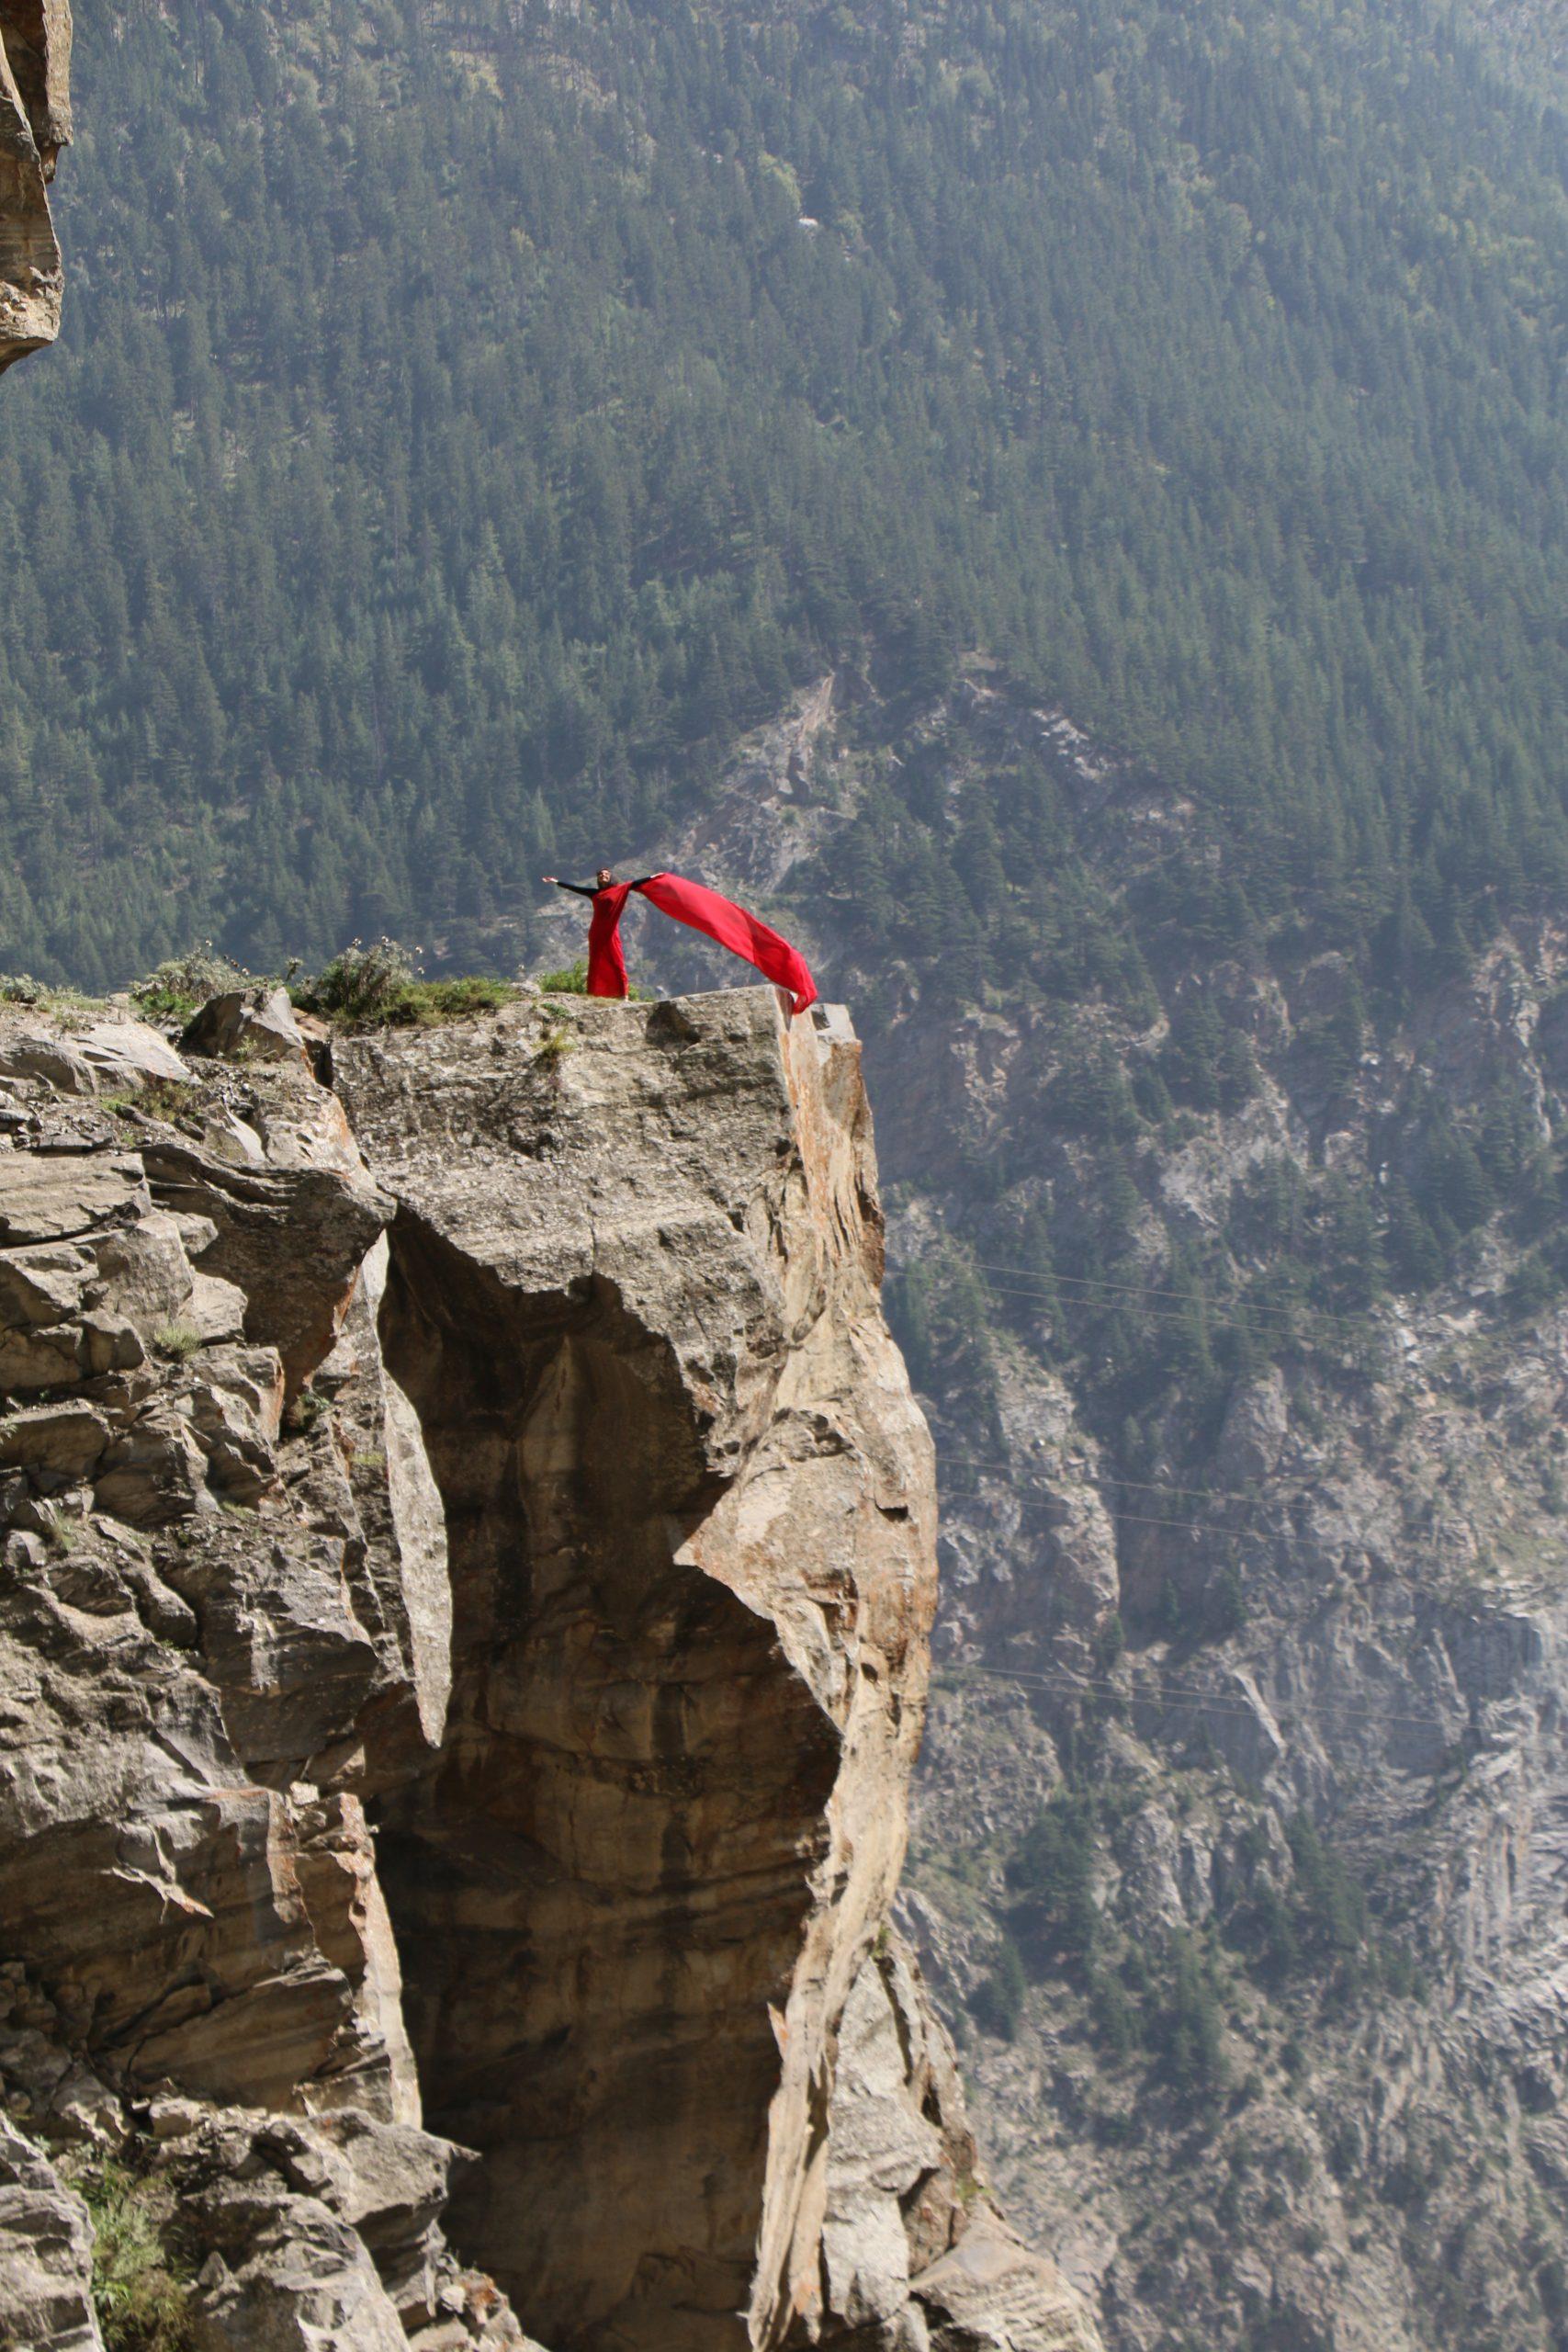 Indian Woman in Saree on Himalaya Rock Mountains